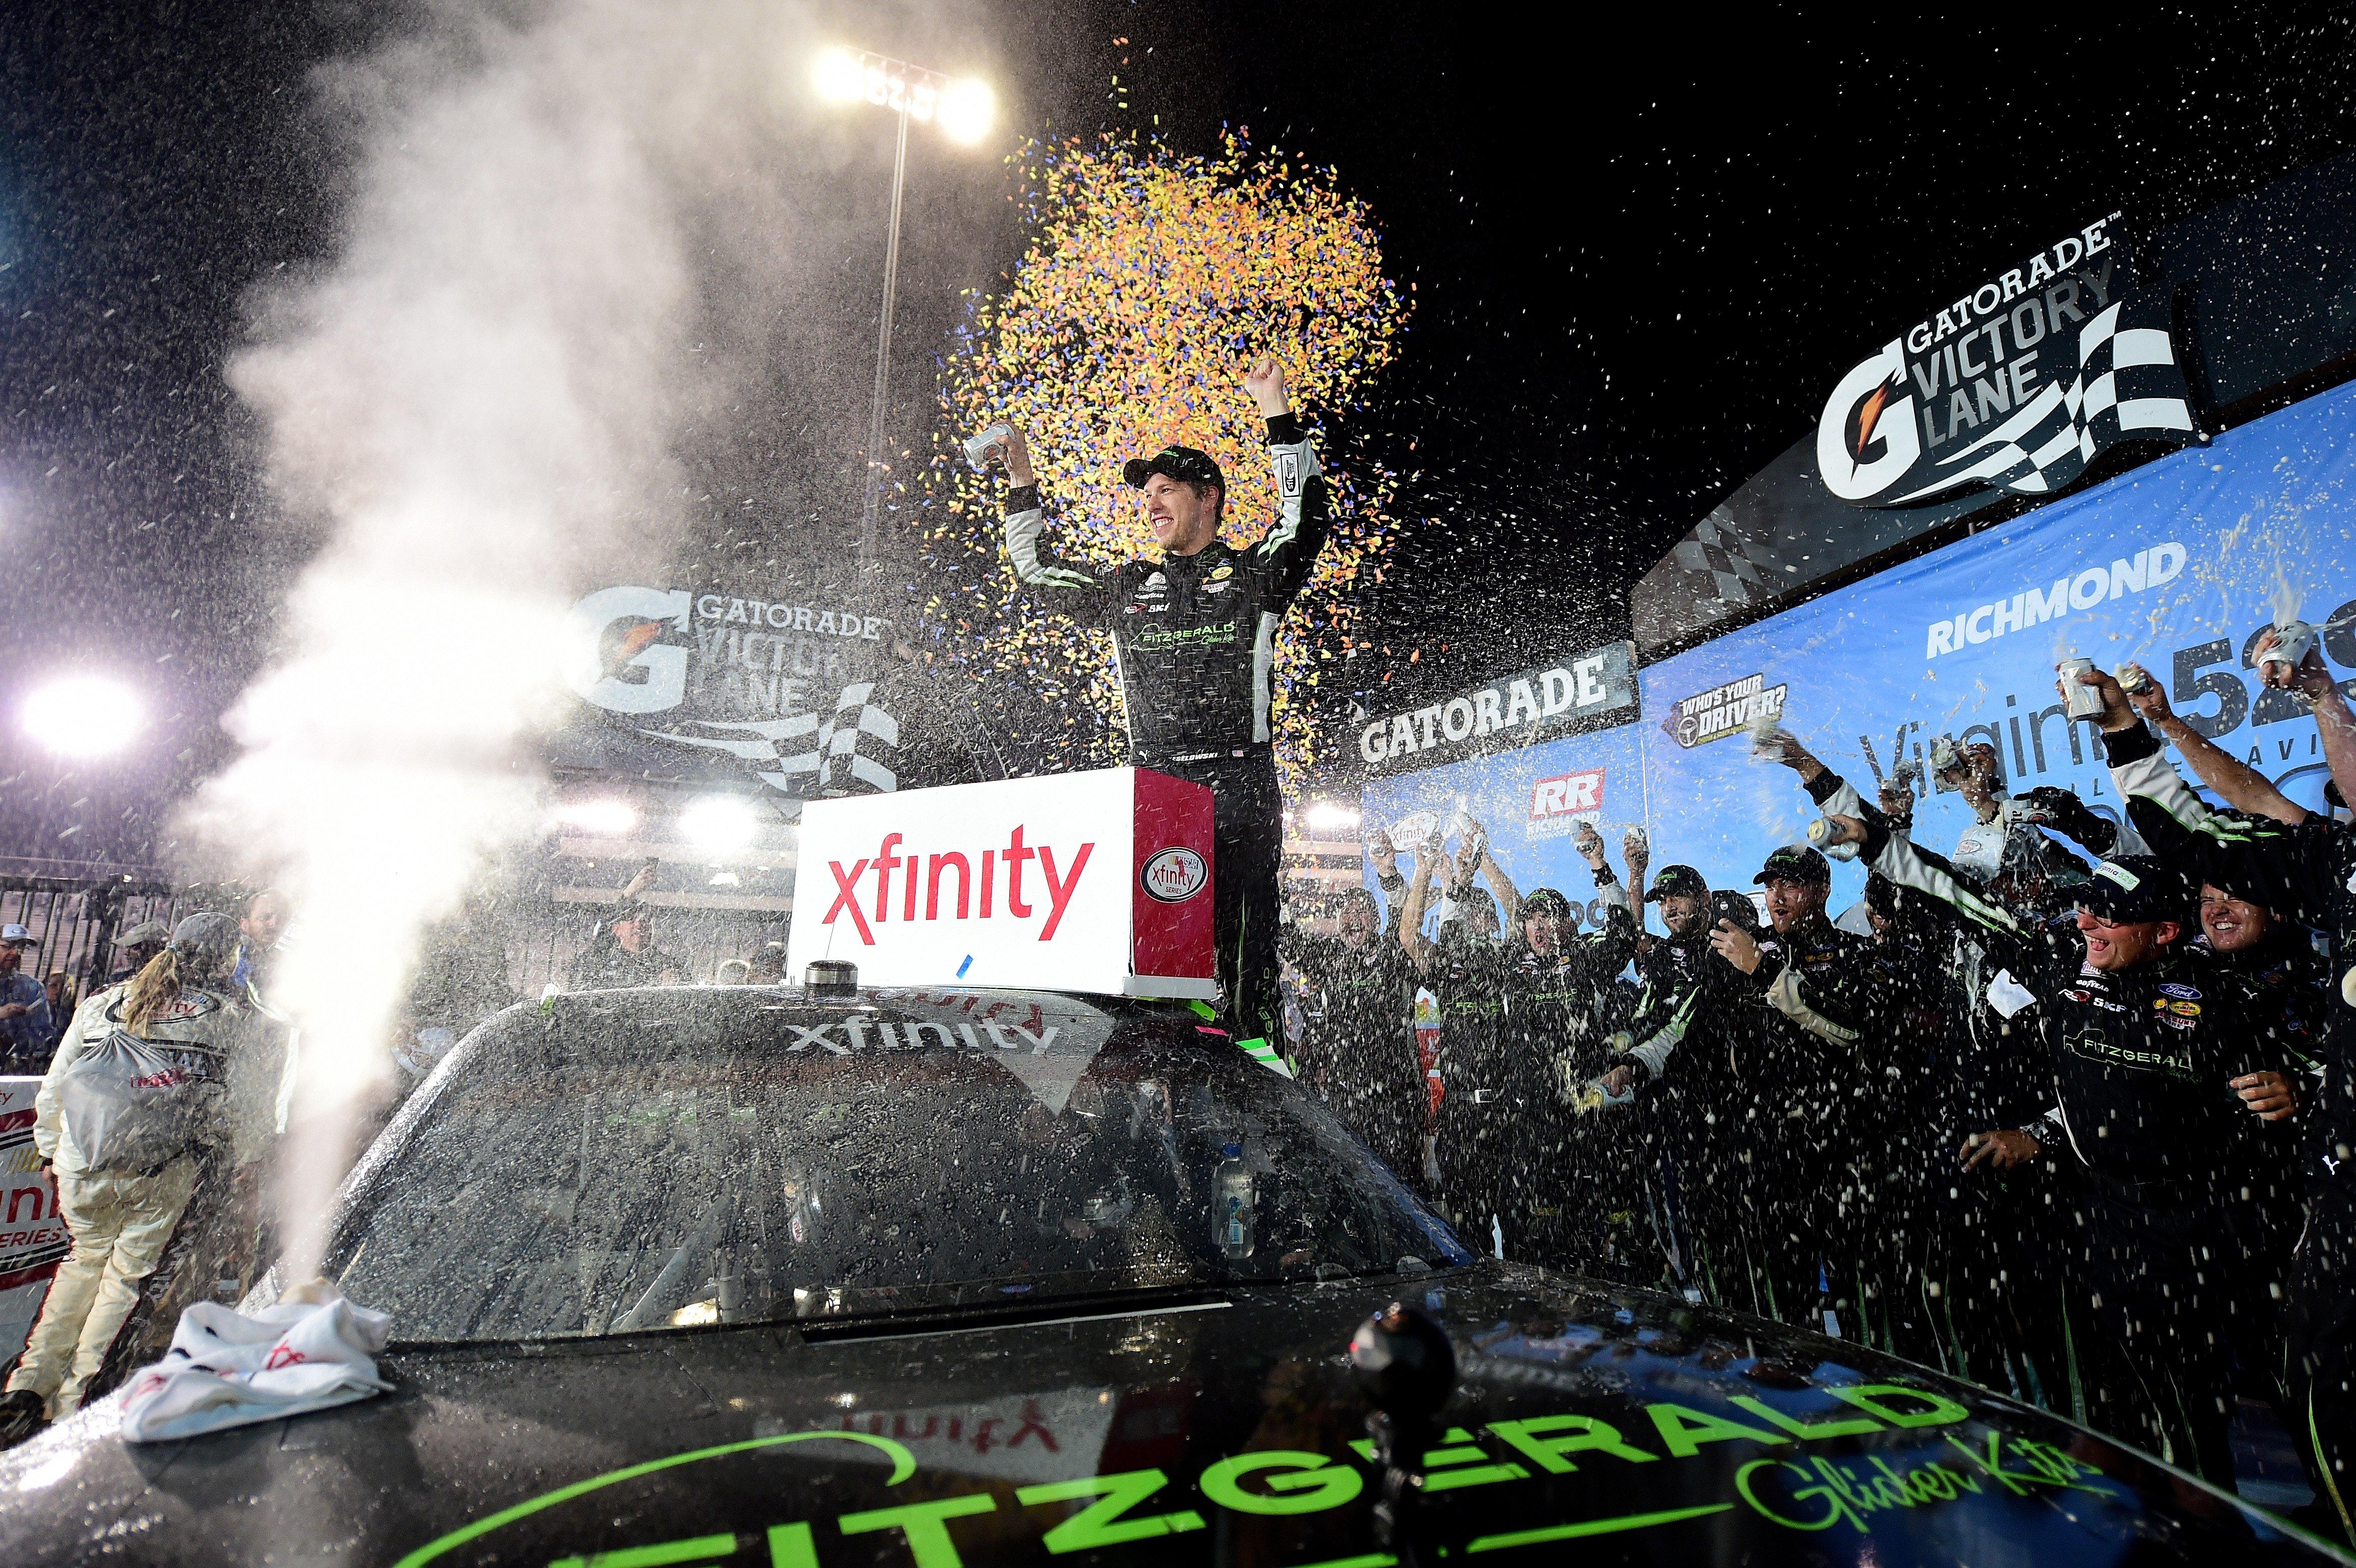 Brad Keselowski wins NASCAR Xfinity race at Richmond Raceway